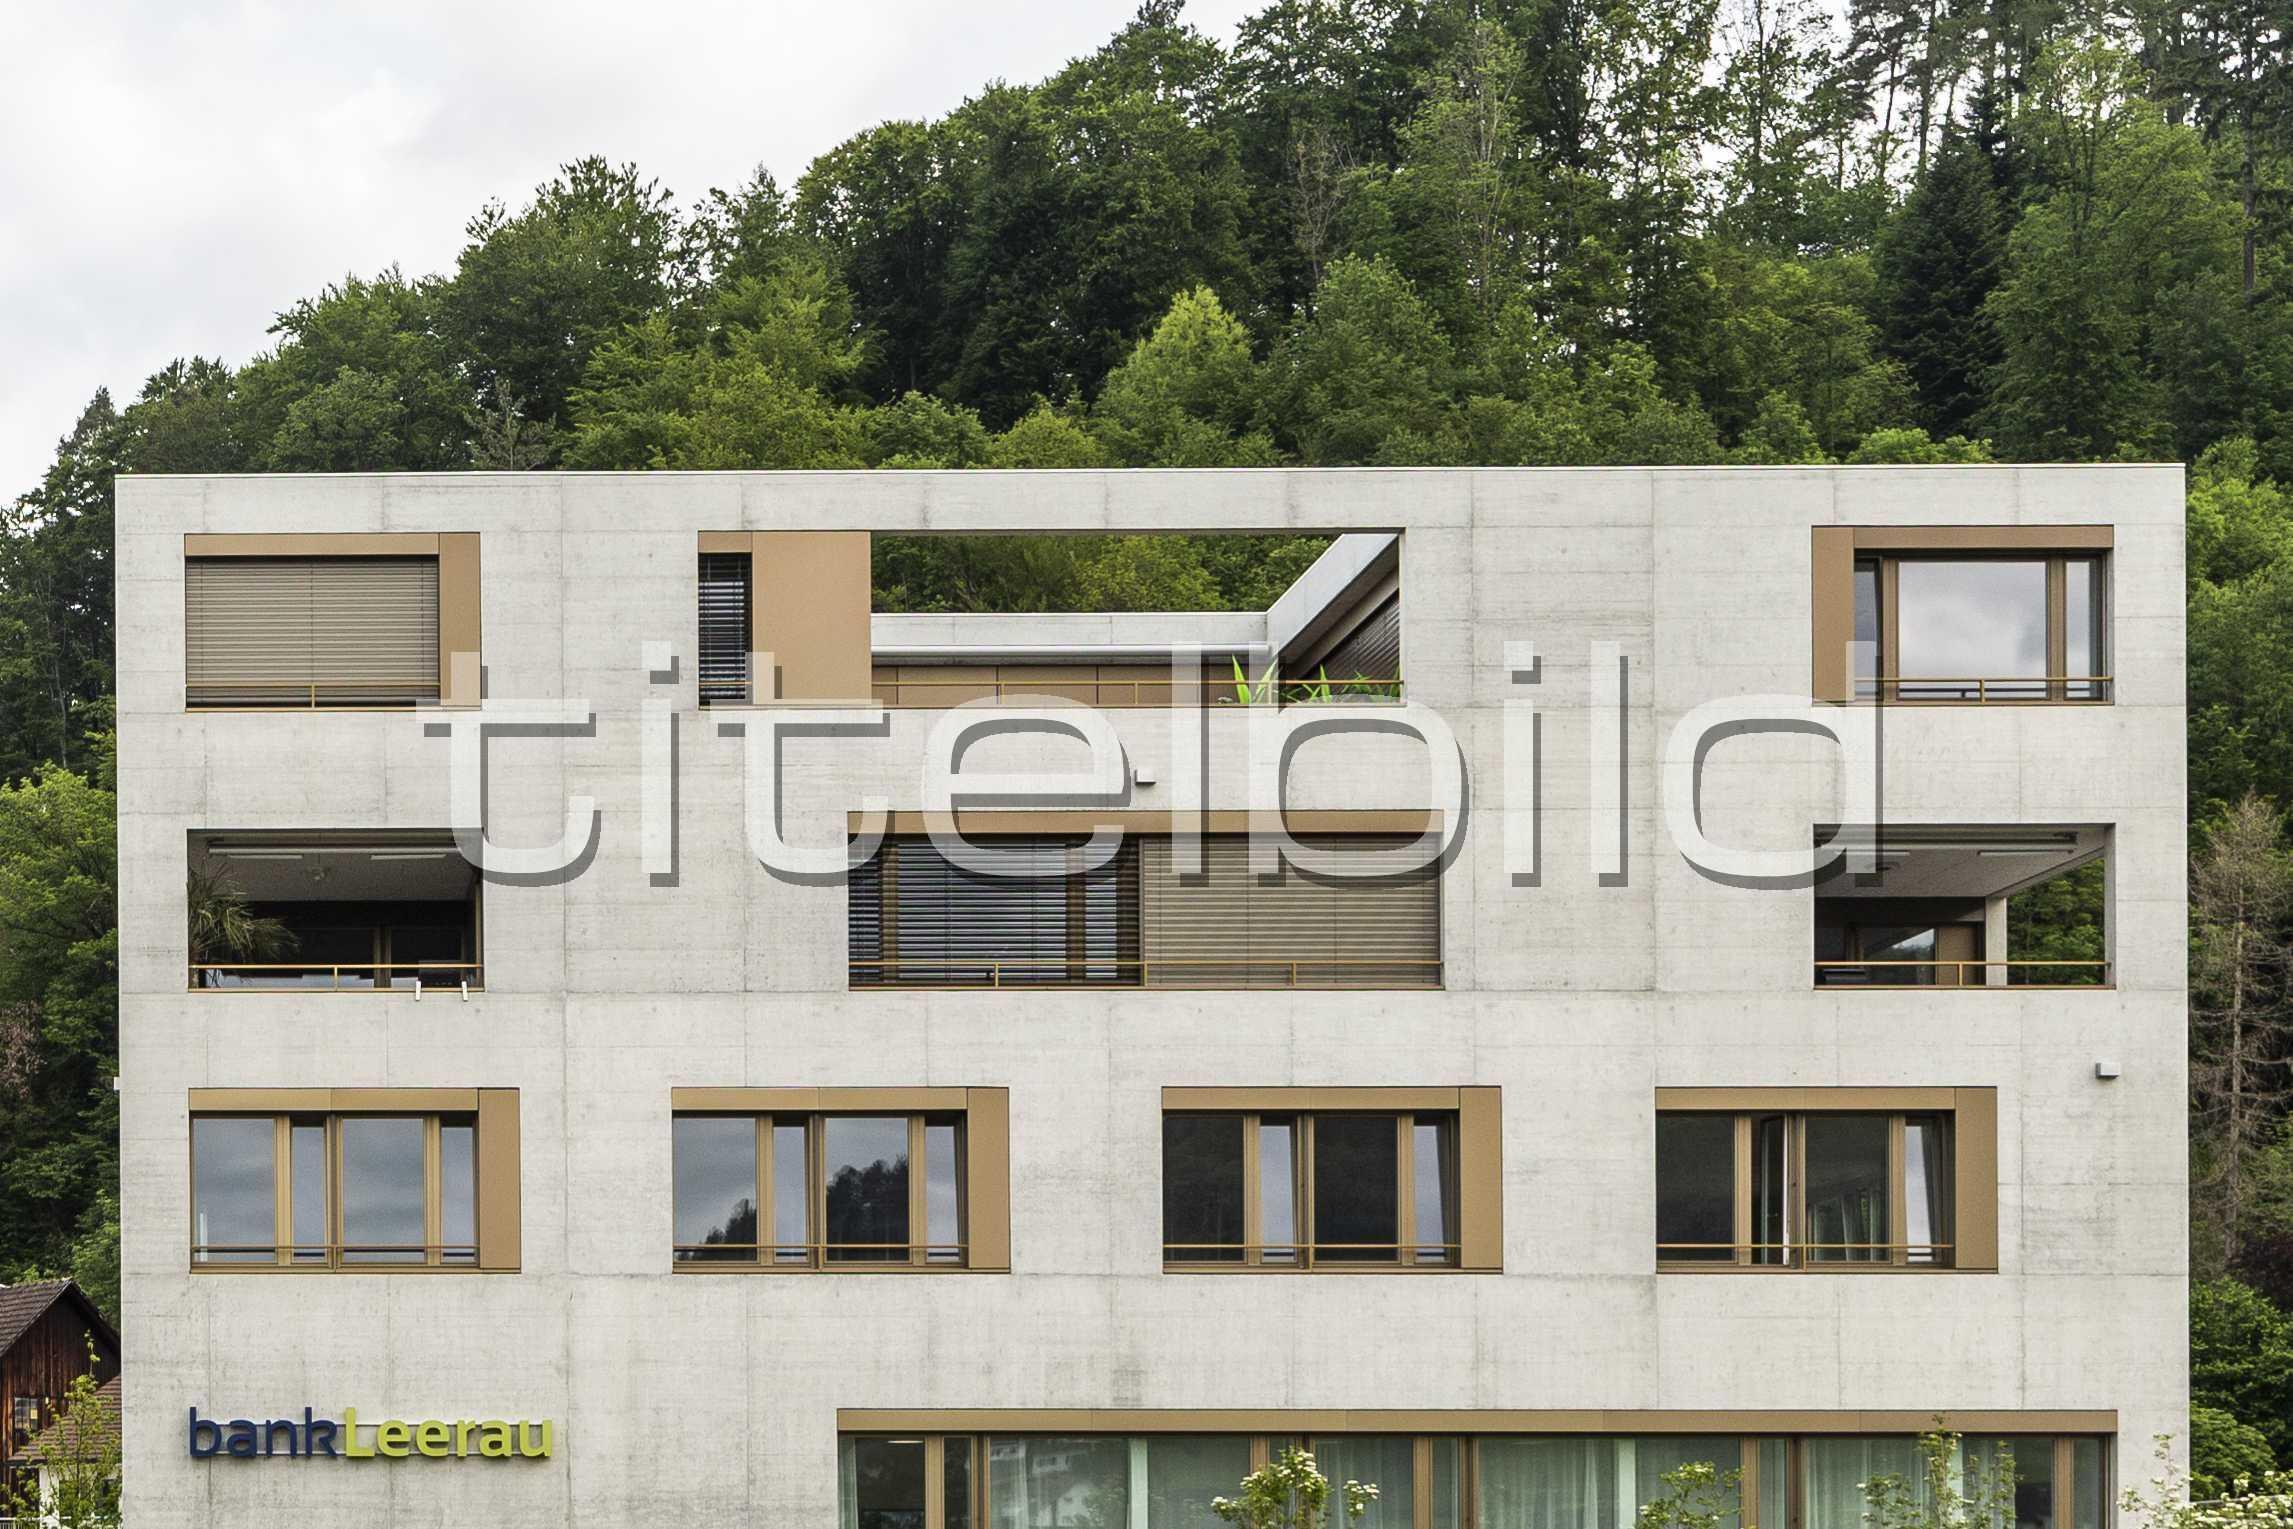 Projektbild-Nr. 4: Bank Leerau, Zentrum-Haus A, Kirchleerau